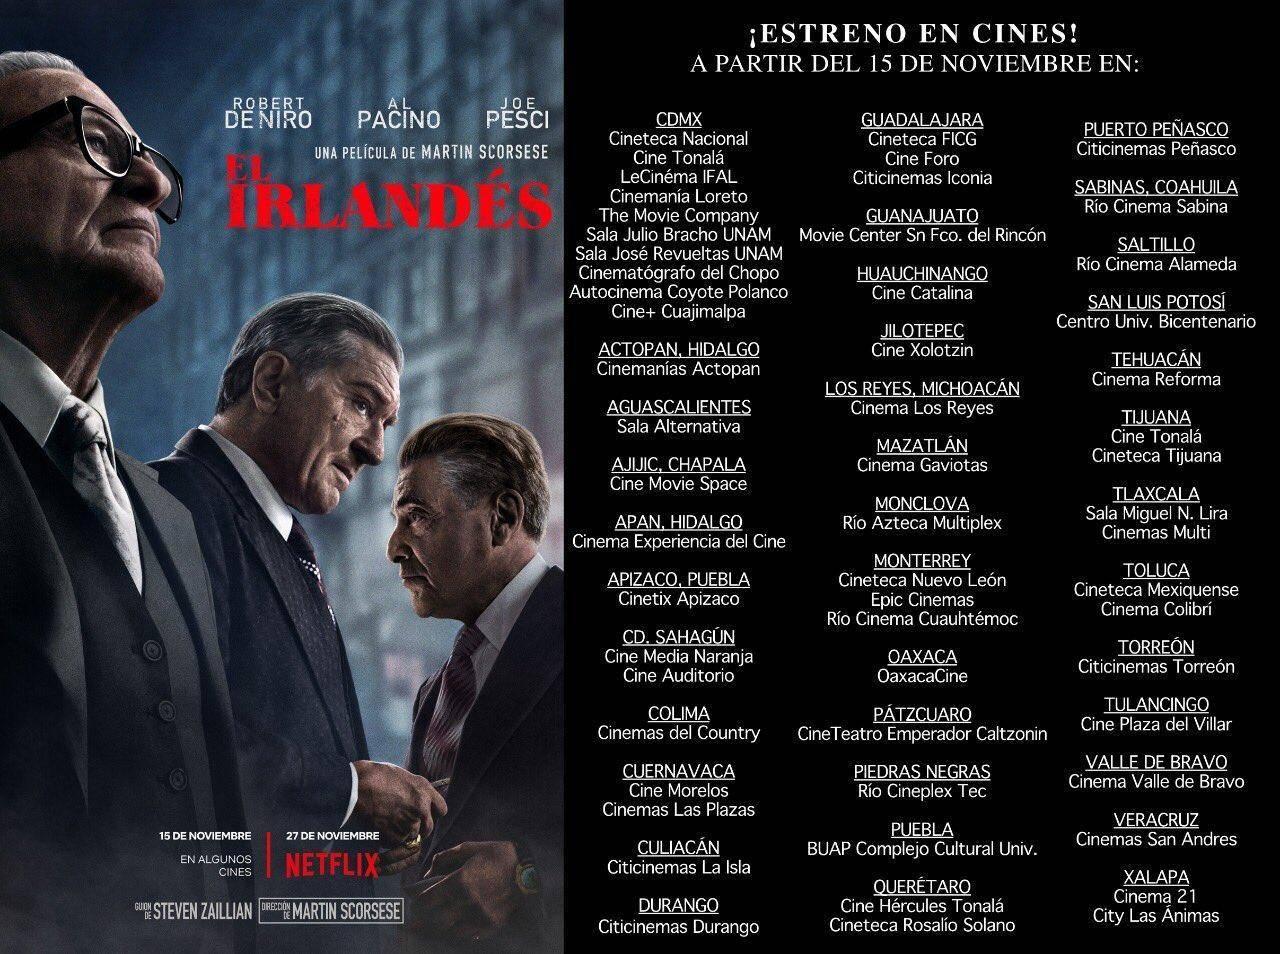 The Irishman (Cines)